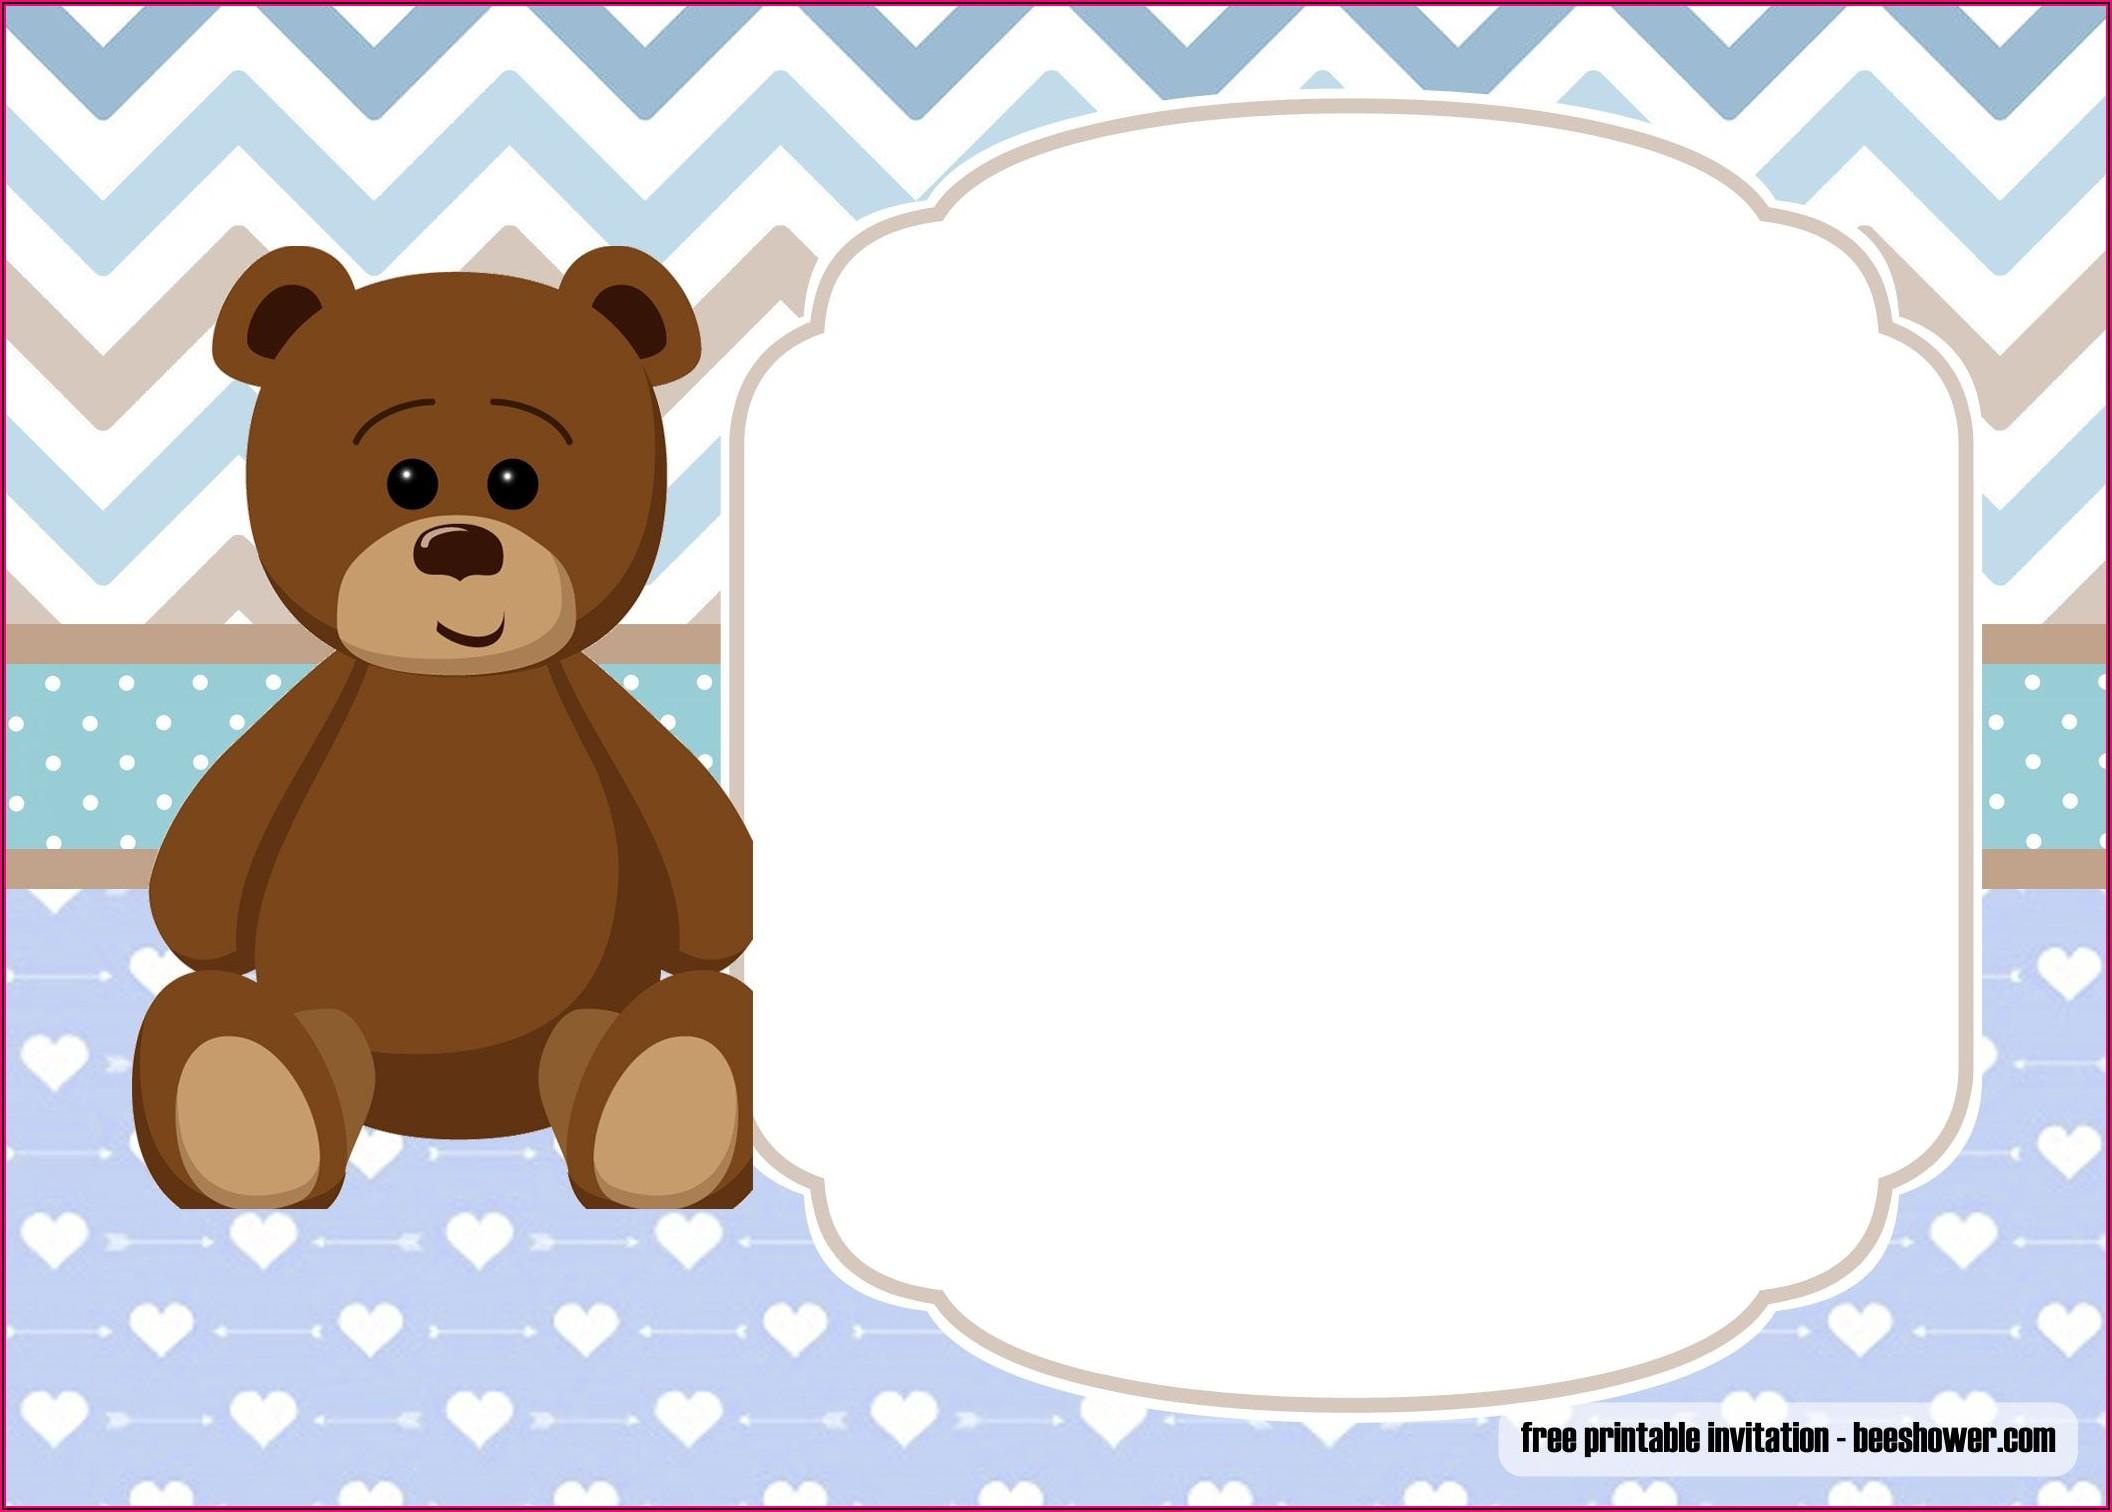 Downloadable Teddy Bear Invitation Template Free